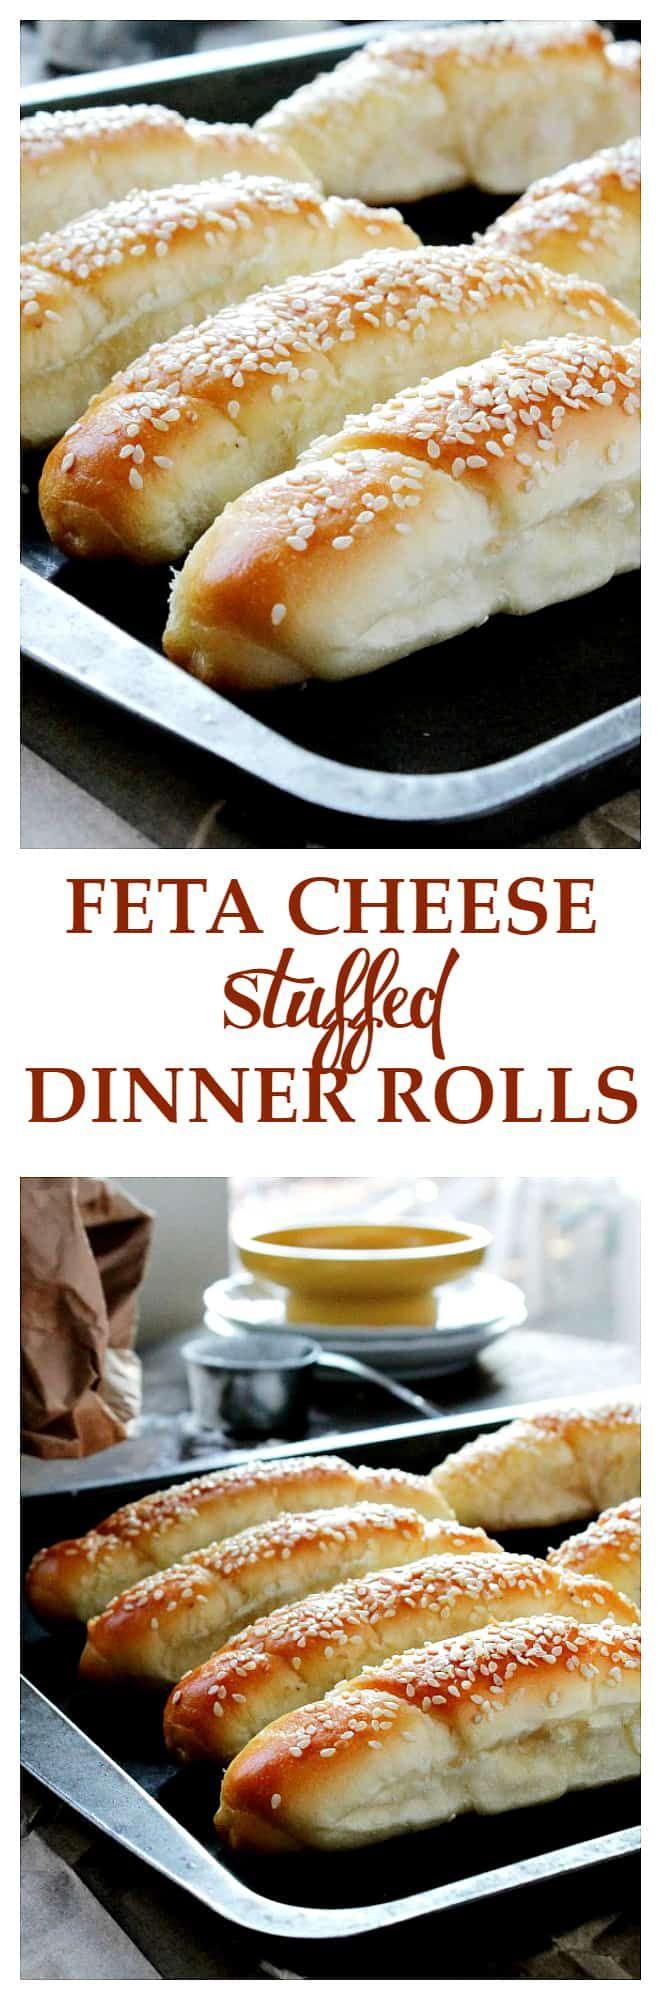 Macedonian Dinner Rolls with Feta Cheese | Homemade Dinner Rolls